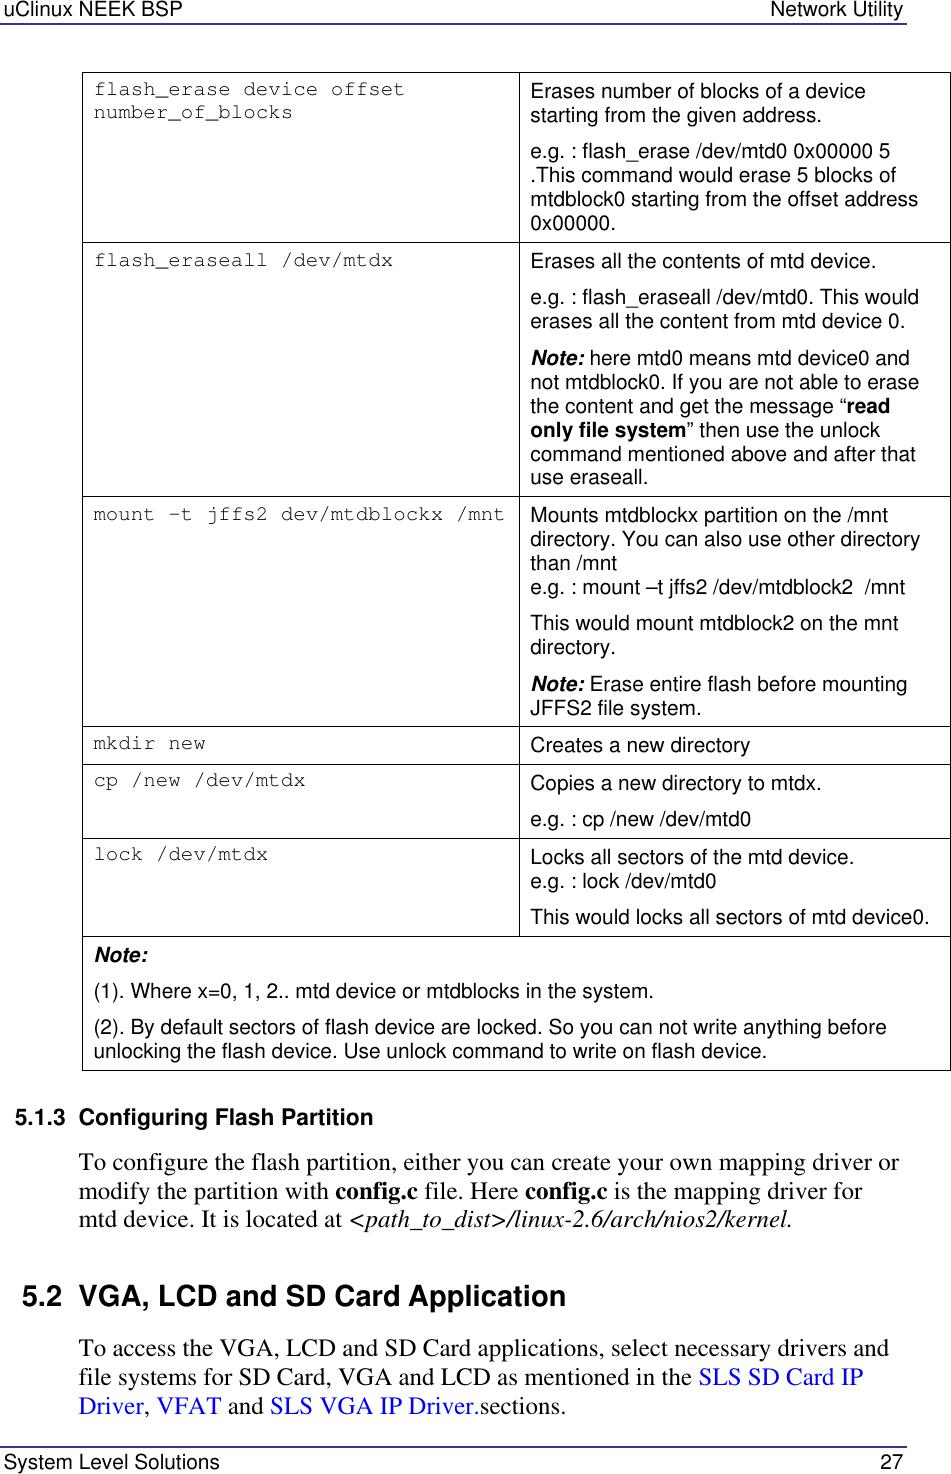 Sls Audio Uclinux Users Manual NEEK BSP